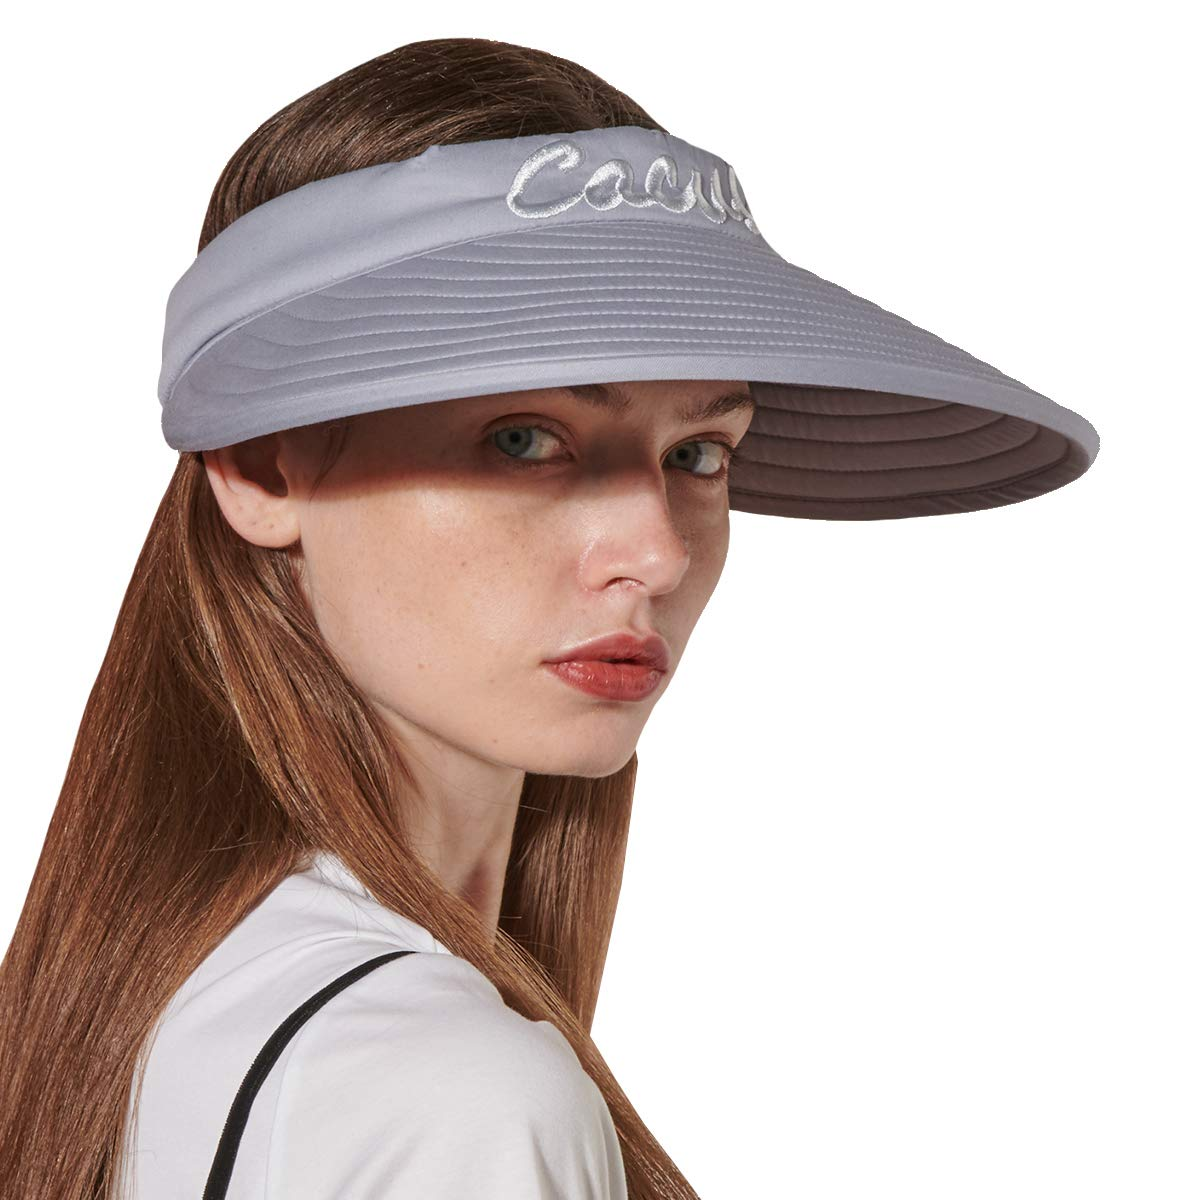 CACUSS Women's Summer Sun Hat Large Brim Visor Adjustable Magic Tape Packable UPF 50+ (Grey)